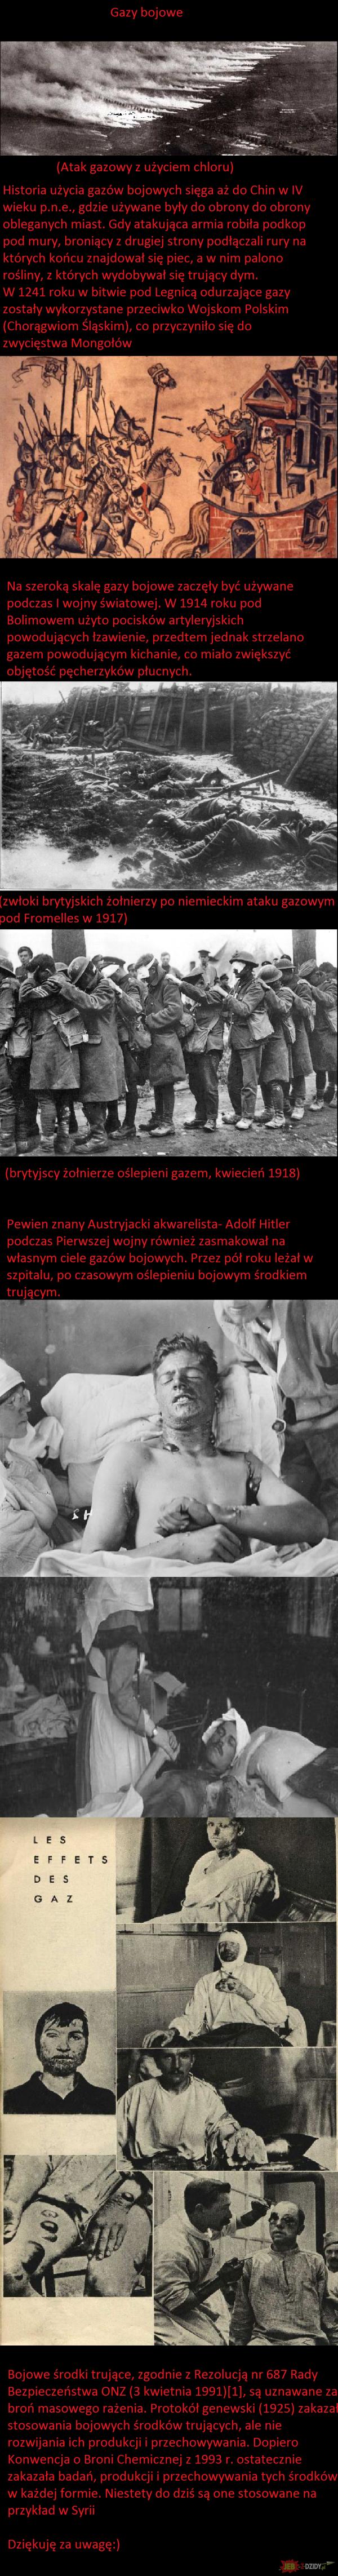 Dzida historyczna part 3